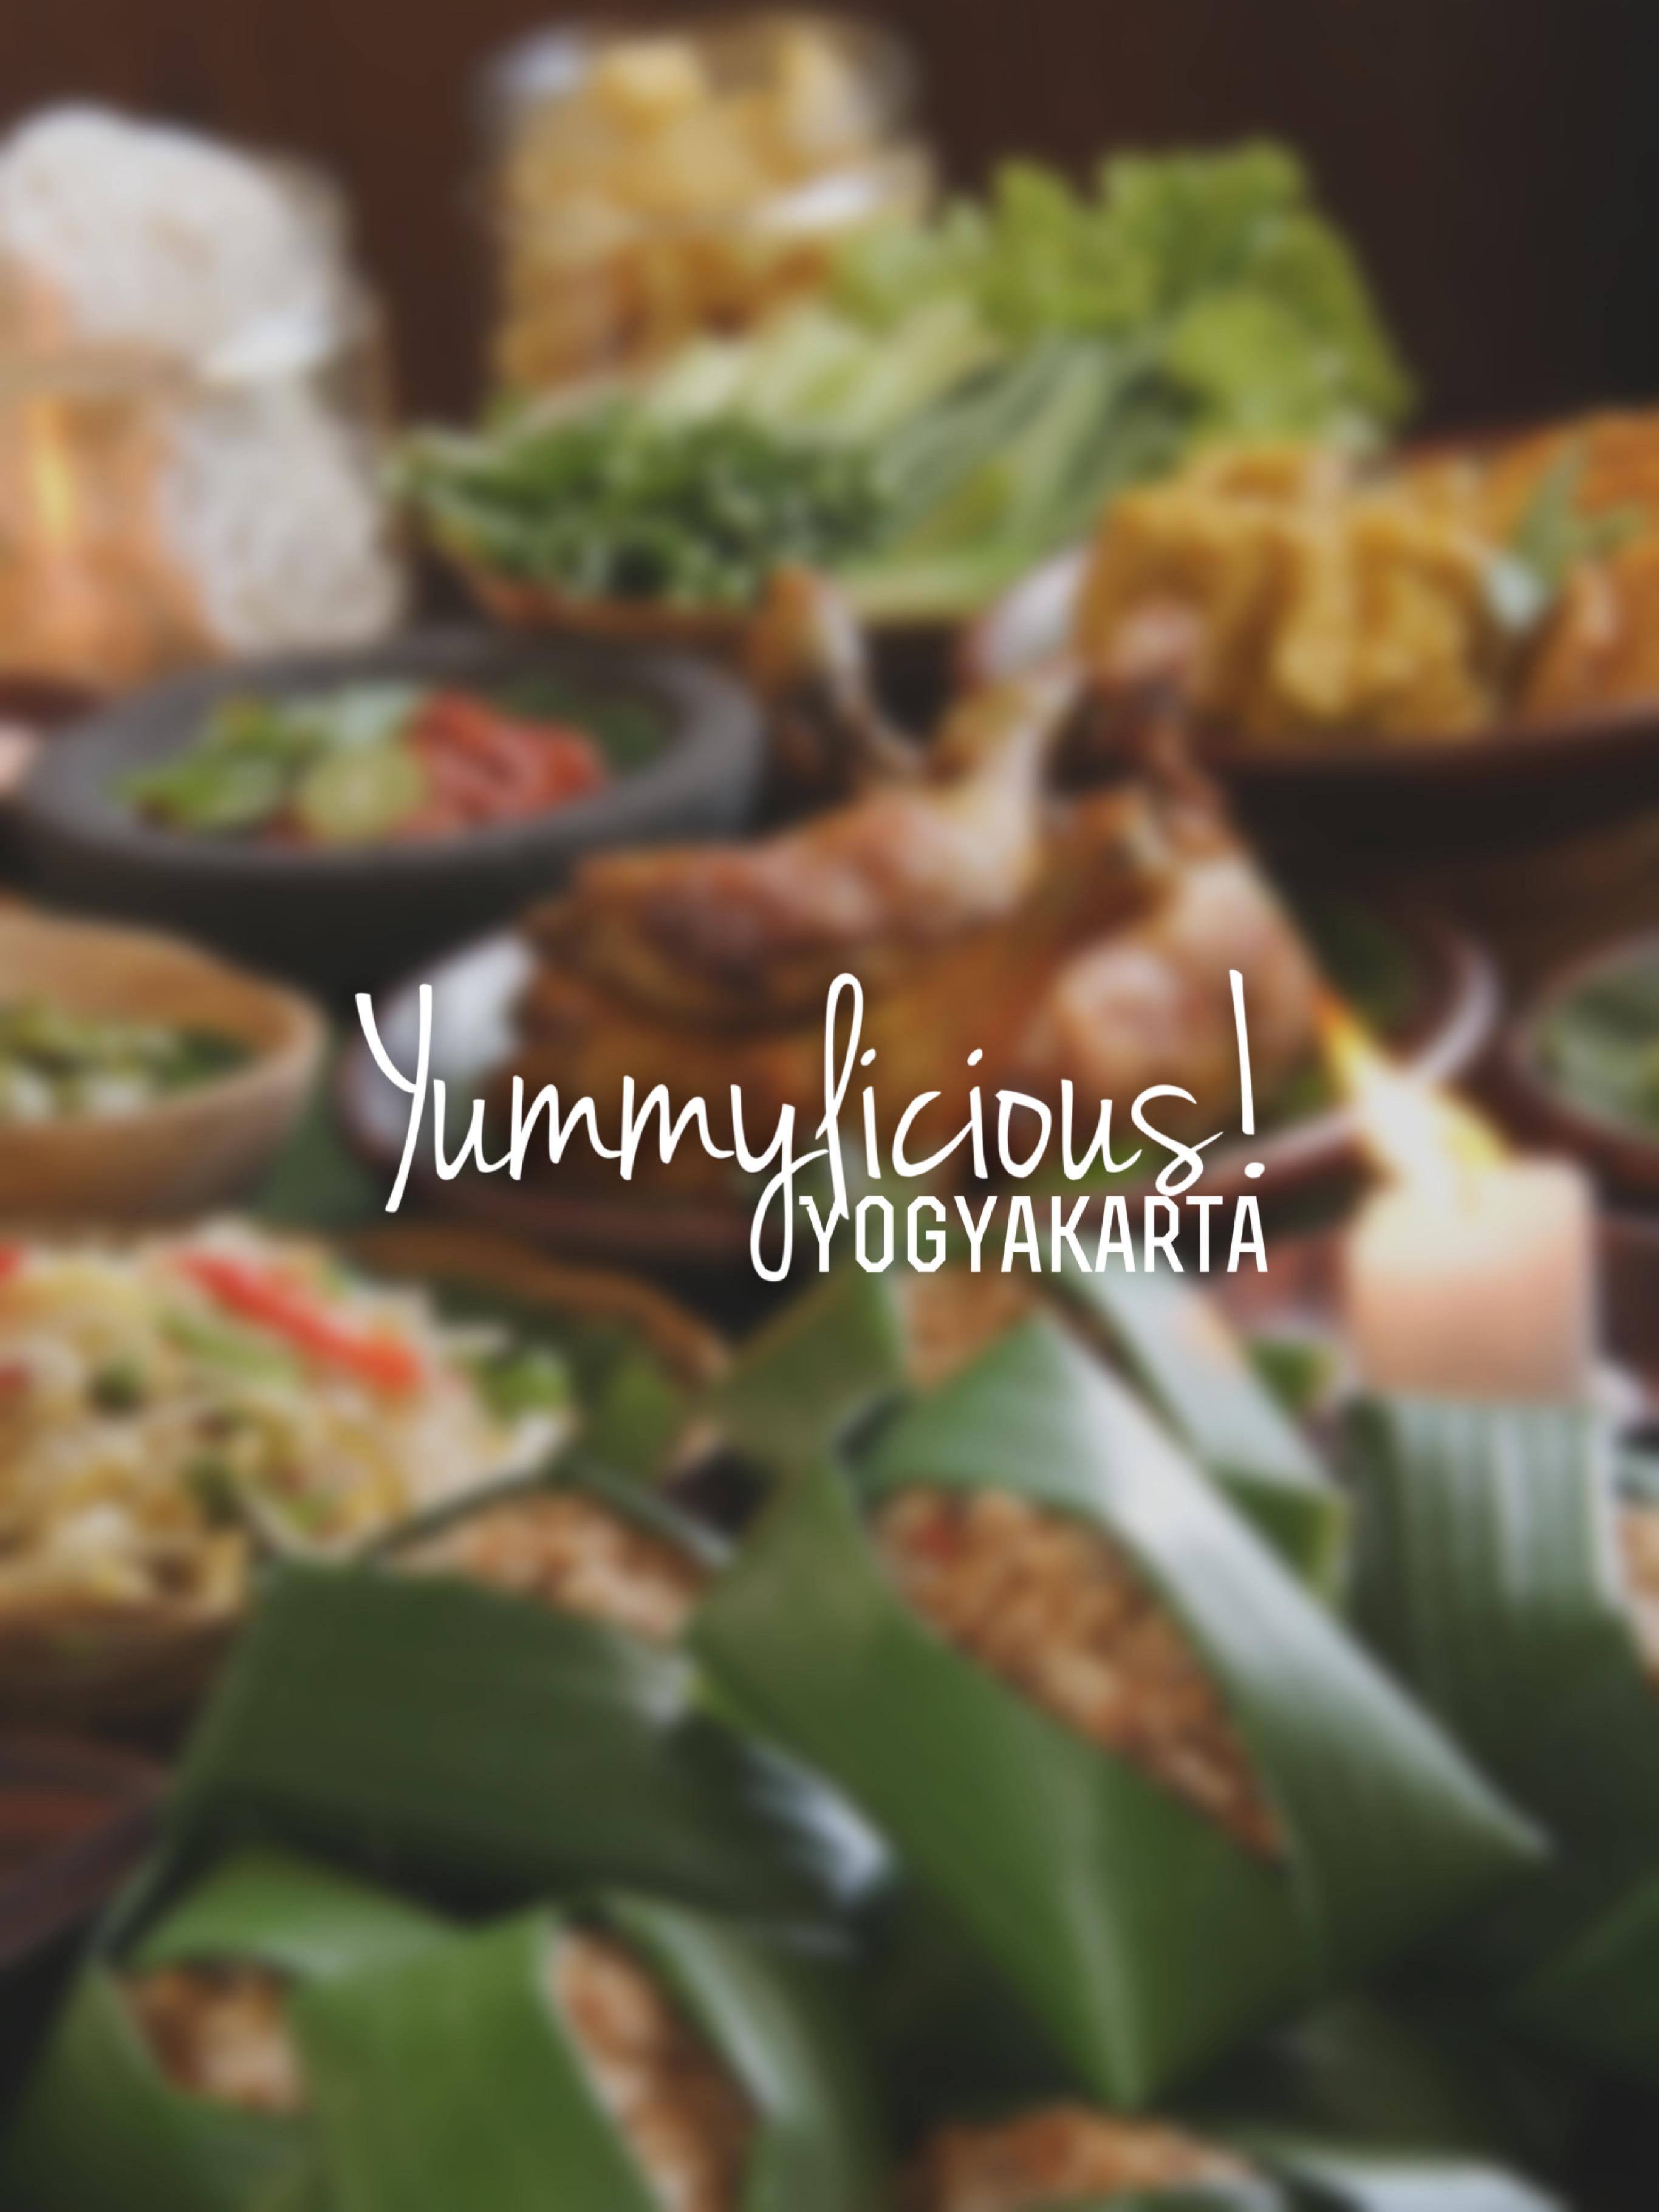 Yummylicious! Yogyakarta!